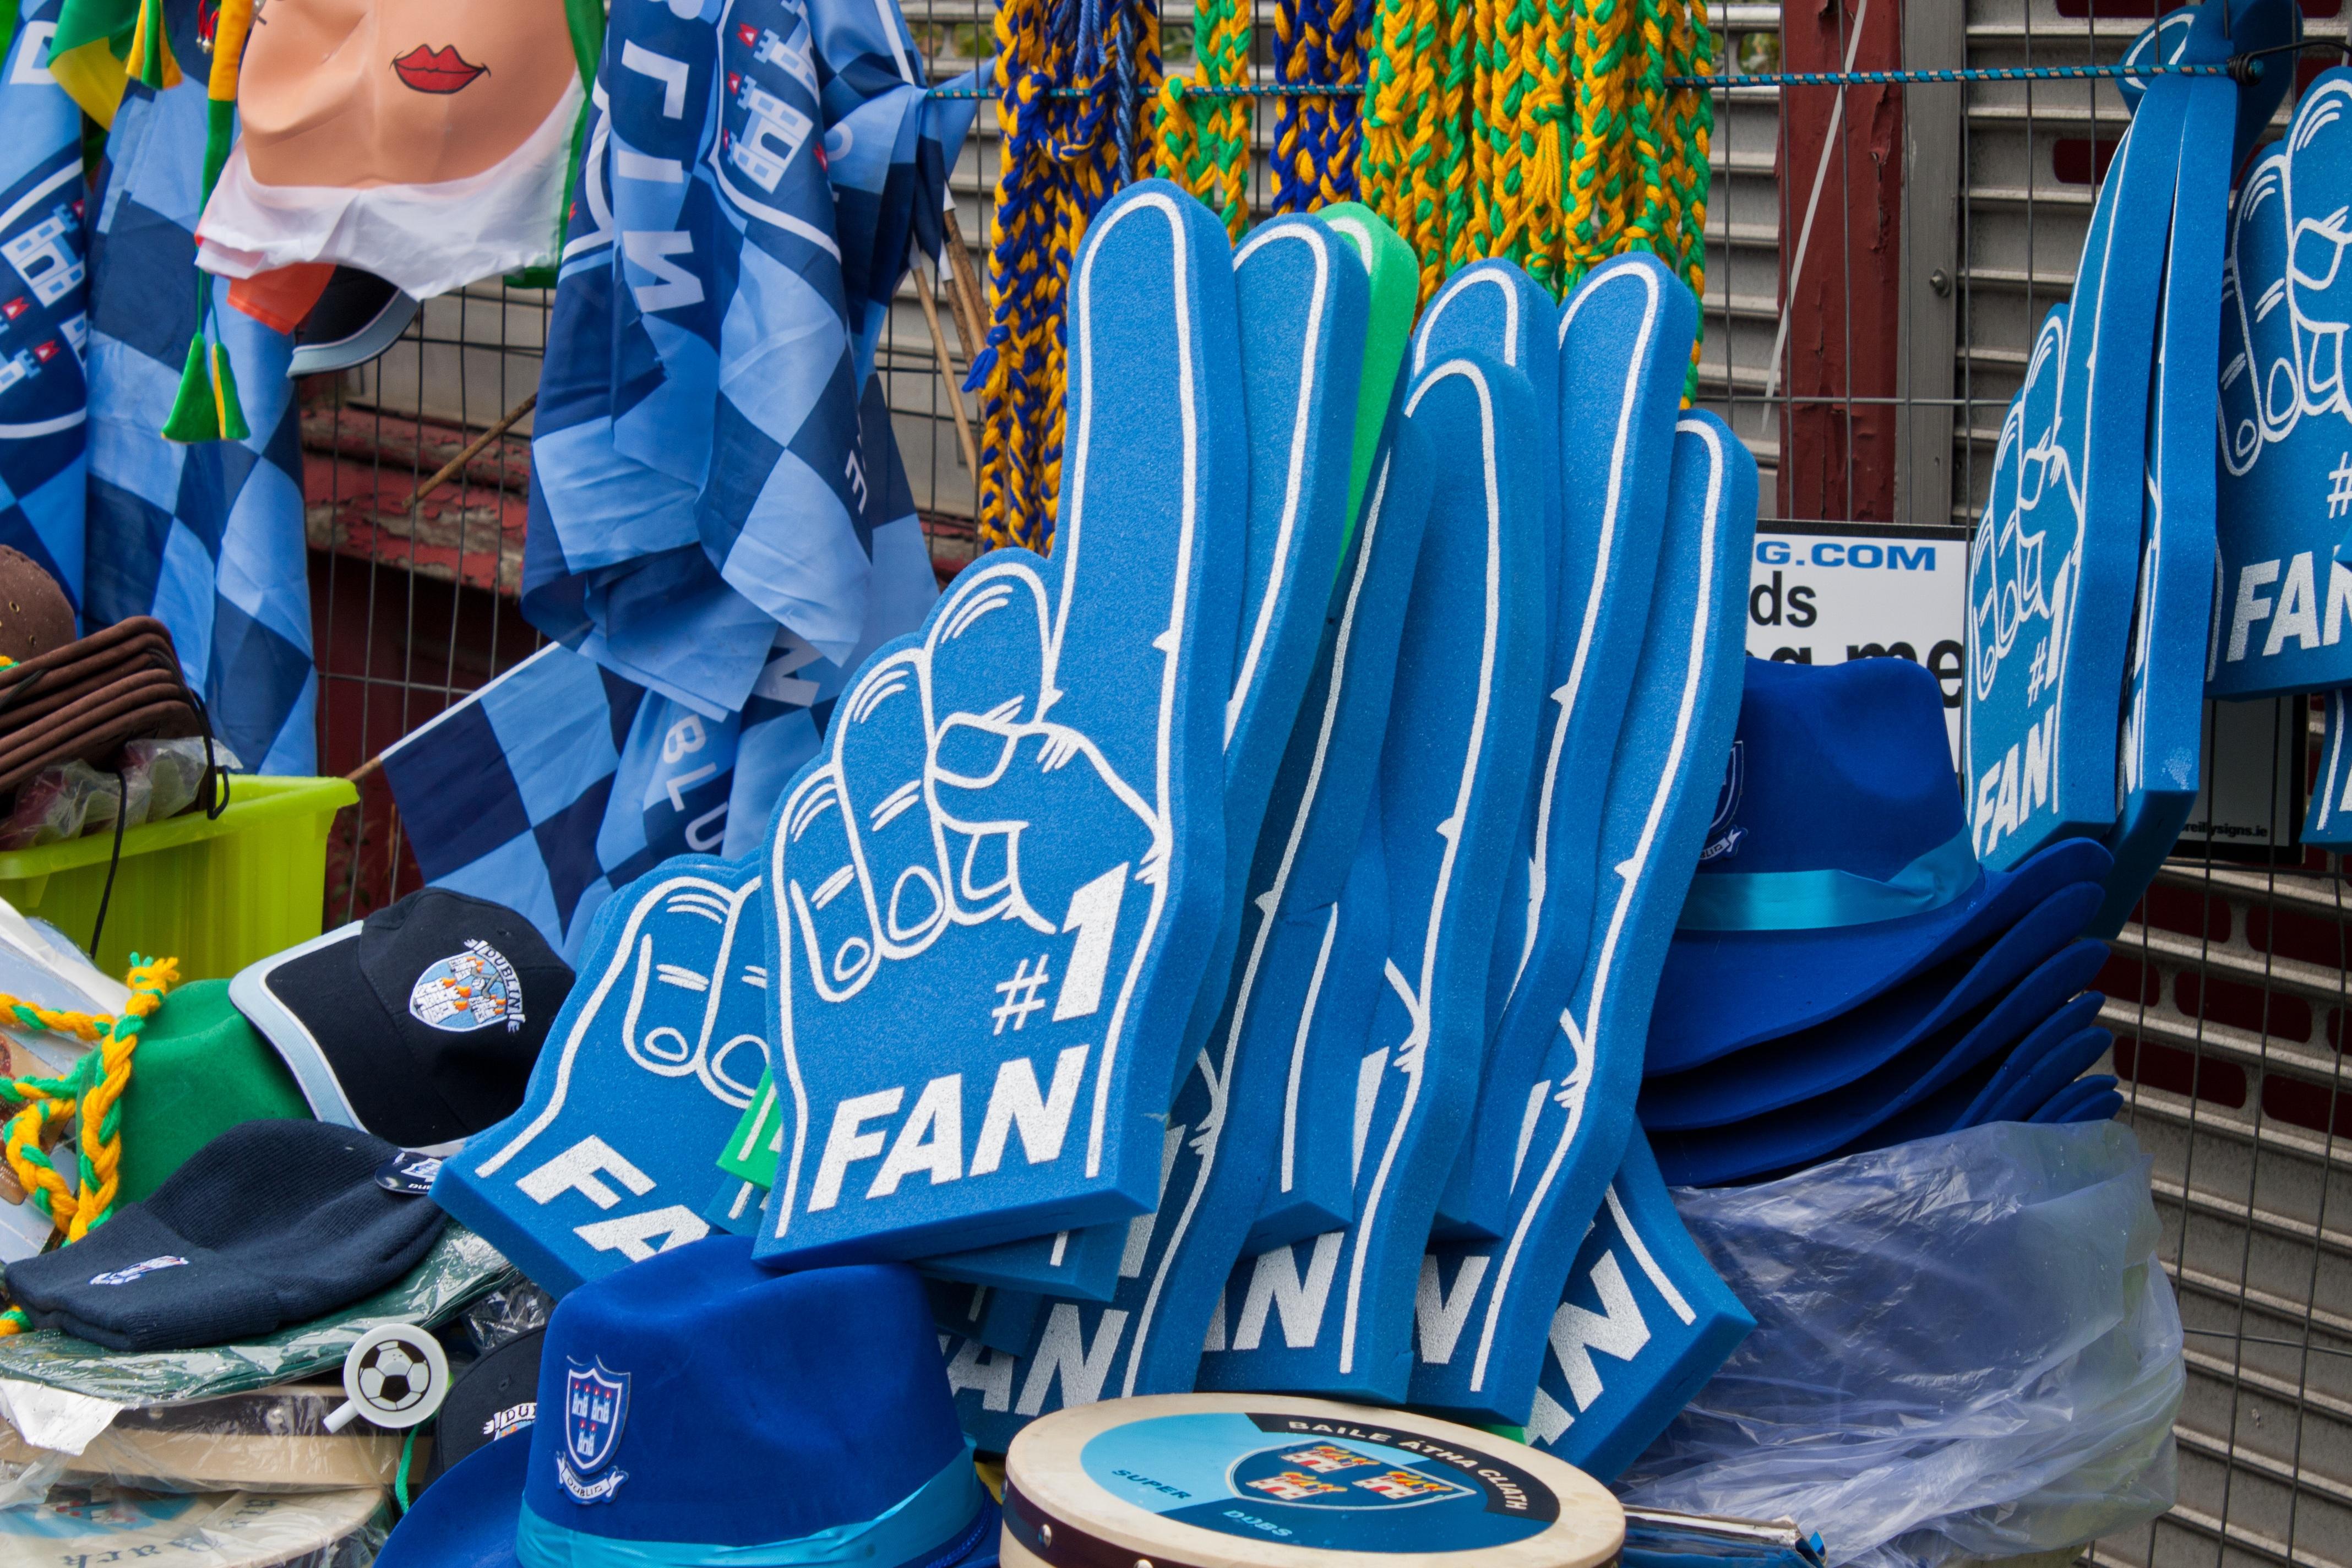 tangan olahraga permainan warna biru penggemar olahraga pendukung artikel fan tangan besar